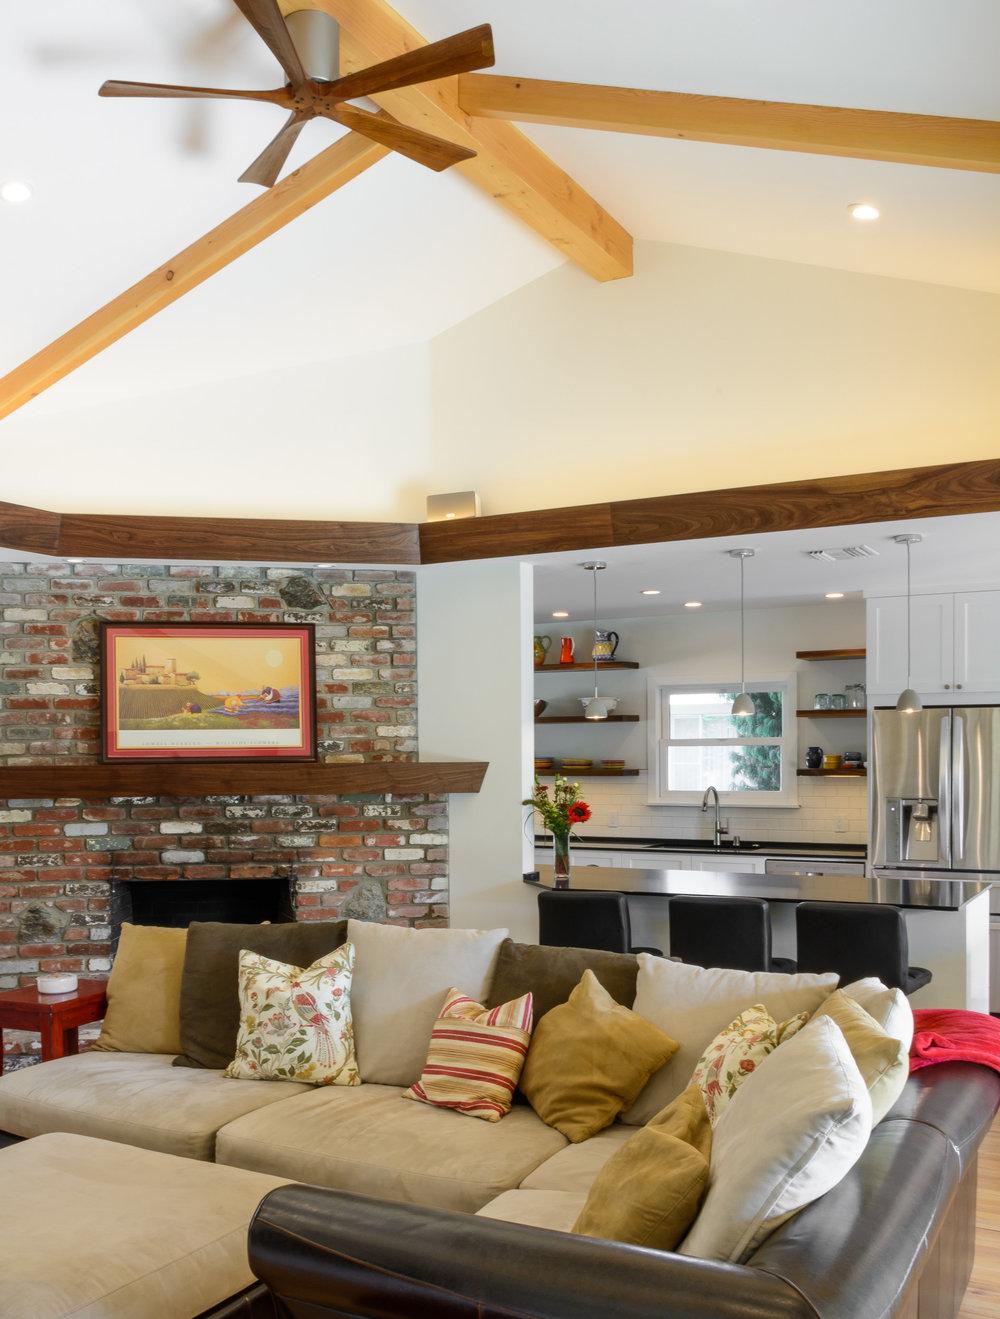 Original brick fireplace with a walnut mantel